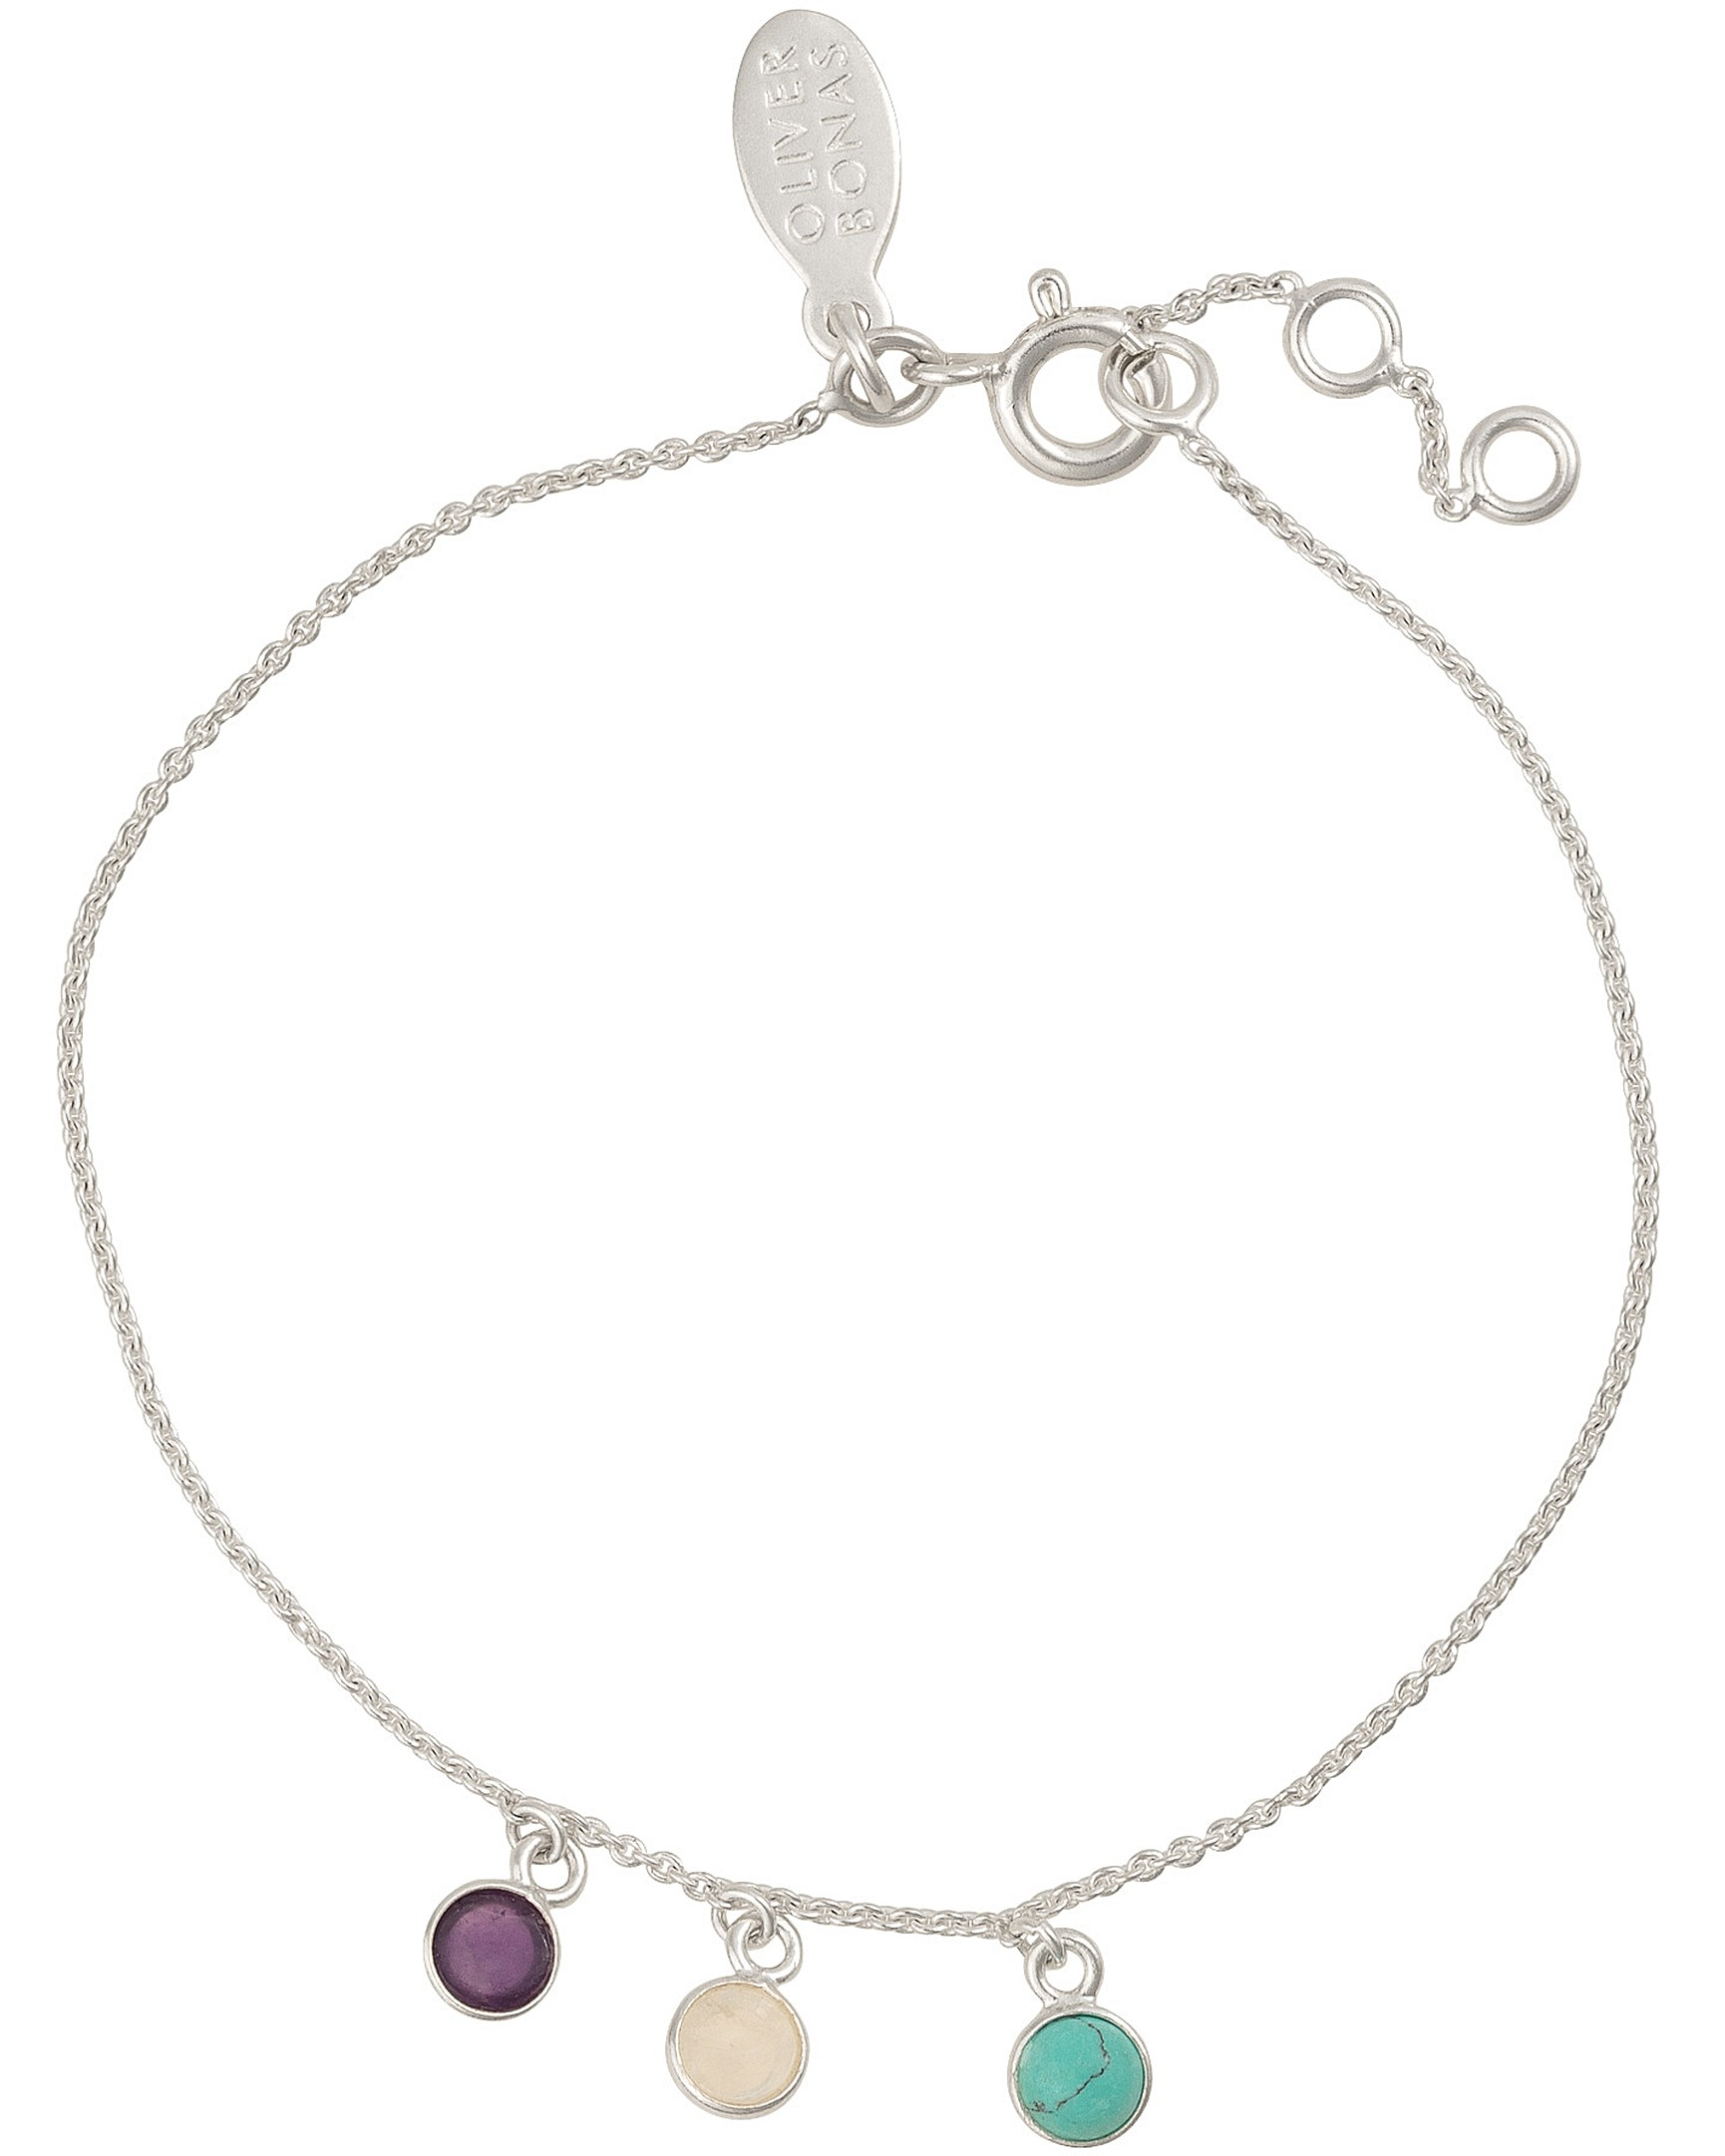 fe62a9dd03813 Bangles & Bracelets - Silver Bangles | Oliver Bonas